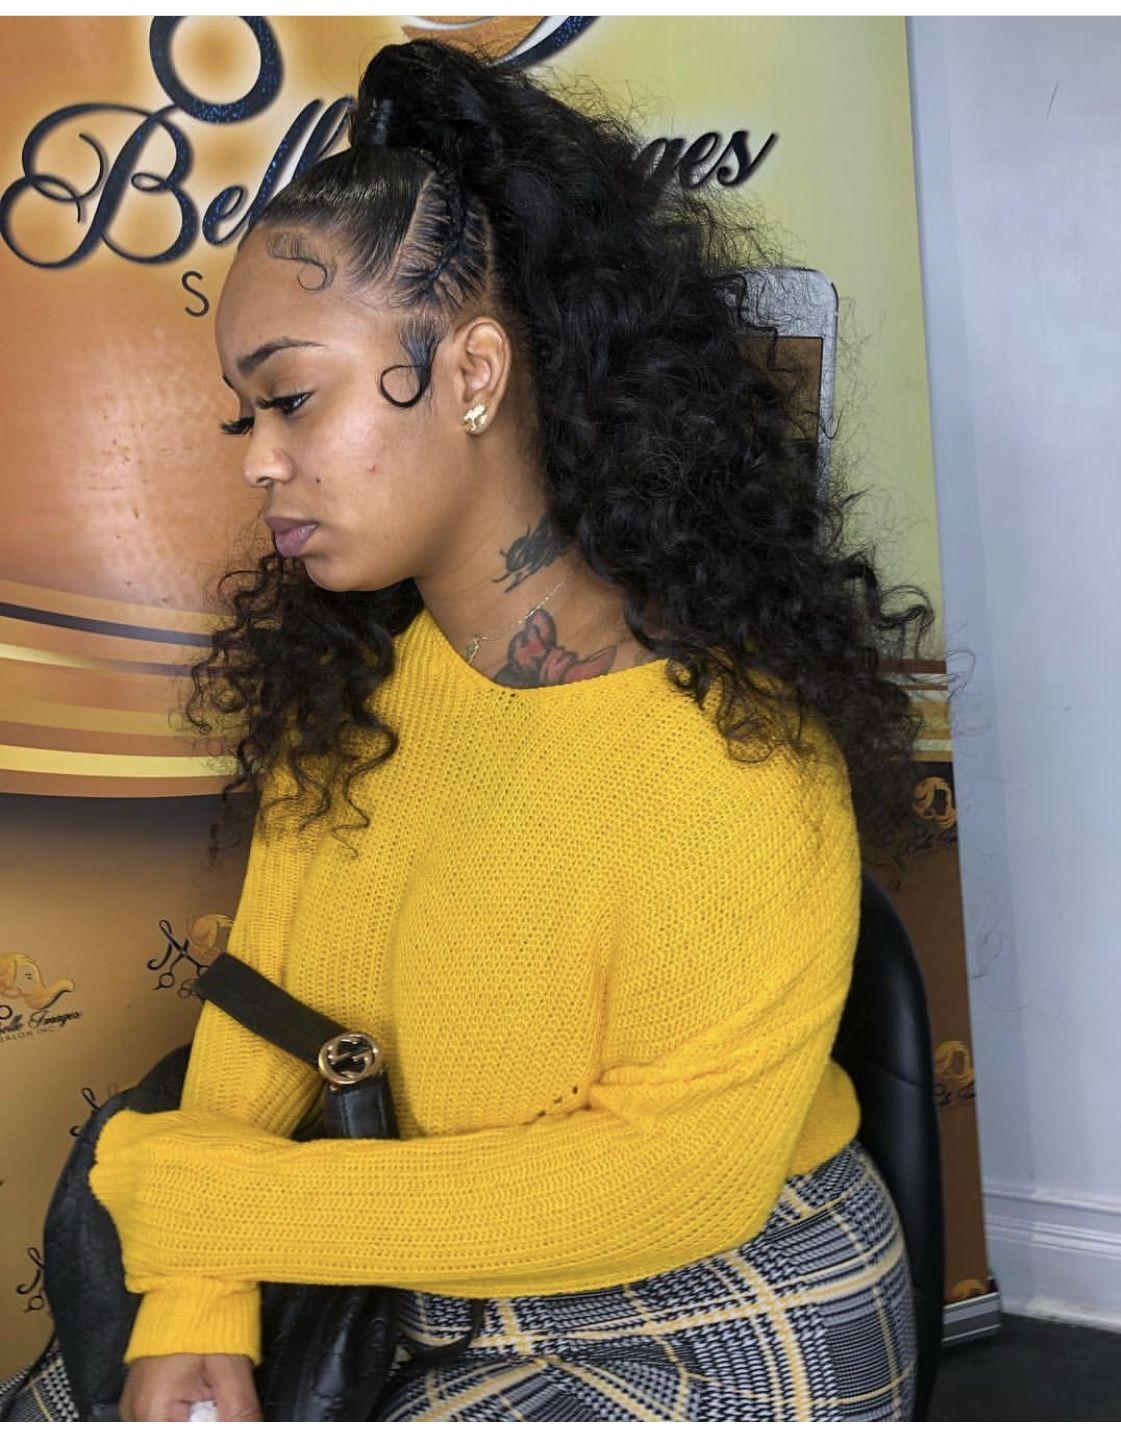 Curly Half Up Half Down ғᴏʟʟᴏᴡ ᴍᴇ Agaicnelabk ғᴏʀ ᴍᴏʀᴇ ᴘɪɴs Black Prom Hairstyles Hair Styles Prom Hair